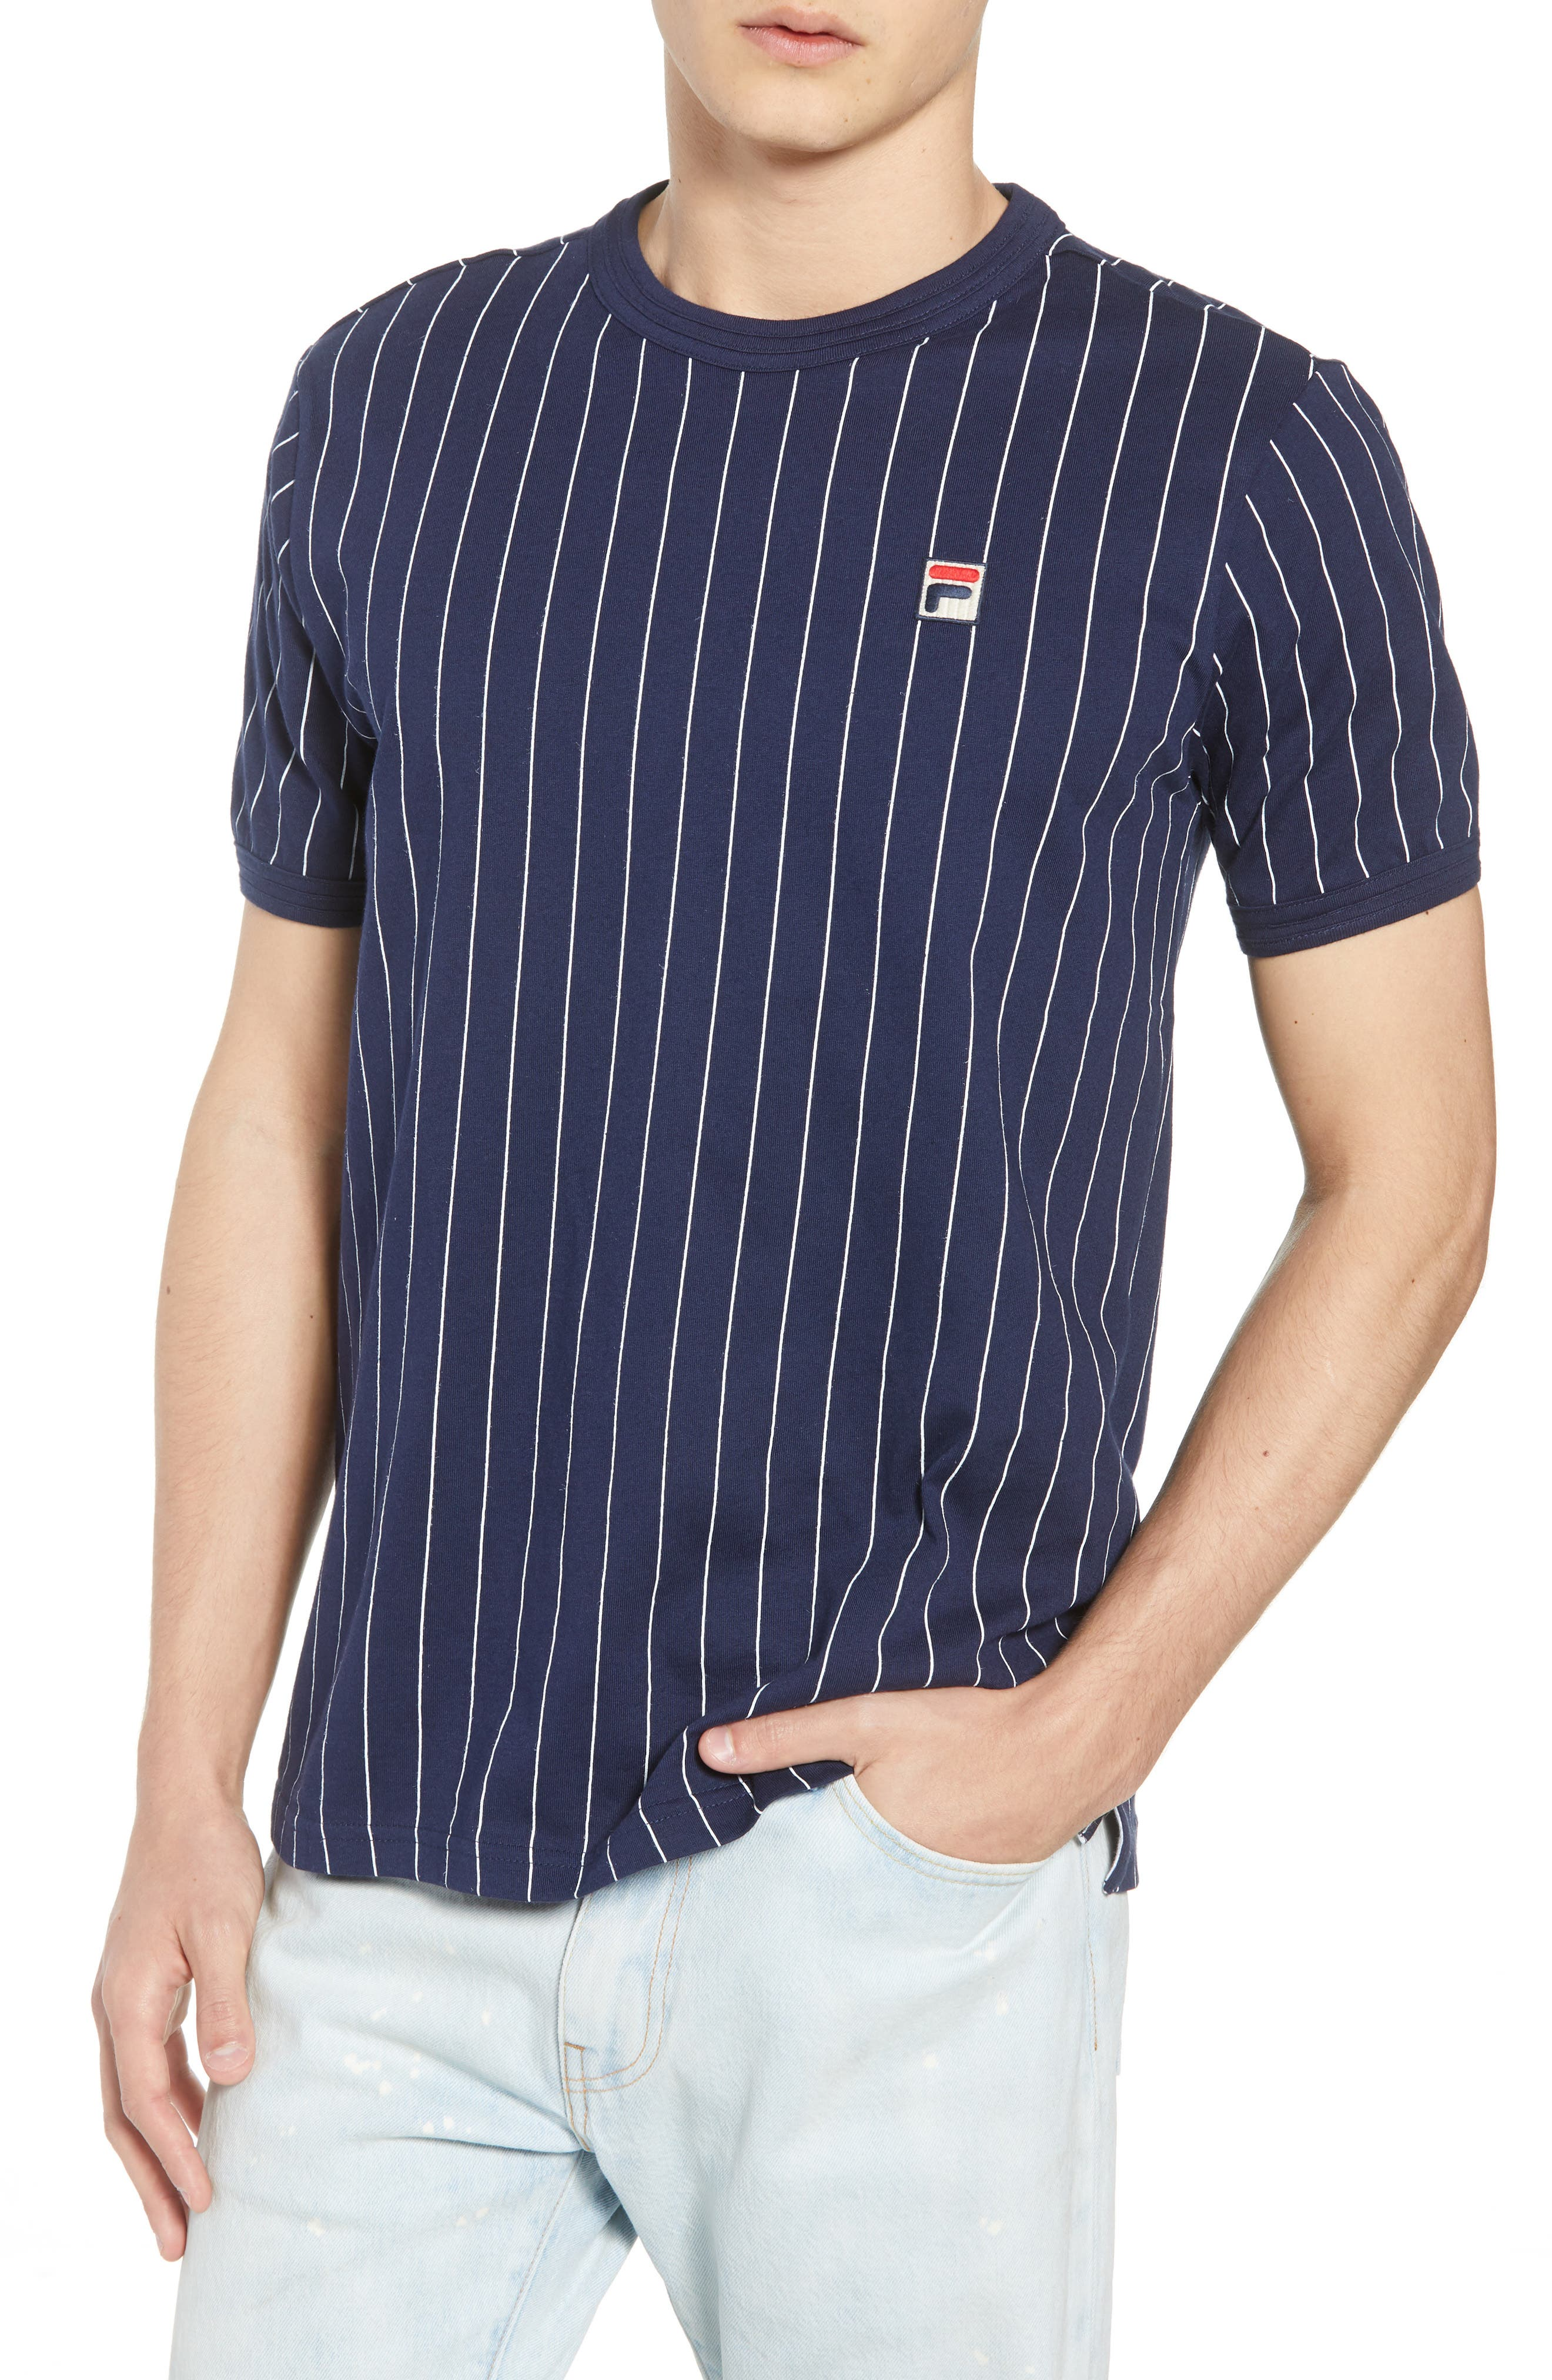 Guilo T-Shirt,                         Main,                         color, PEACOAT/ WHITE